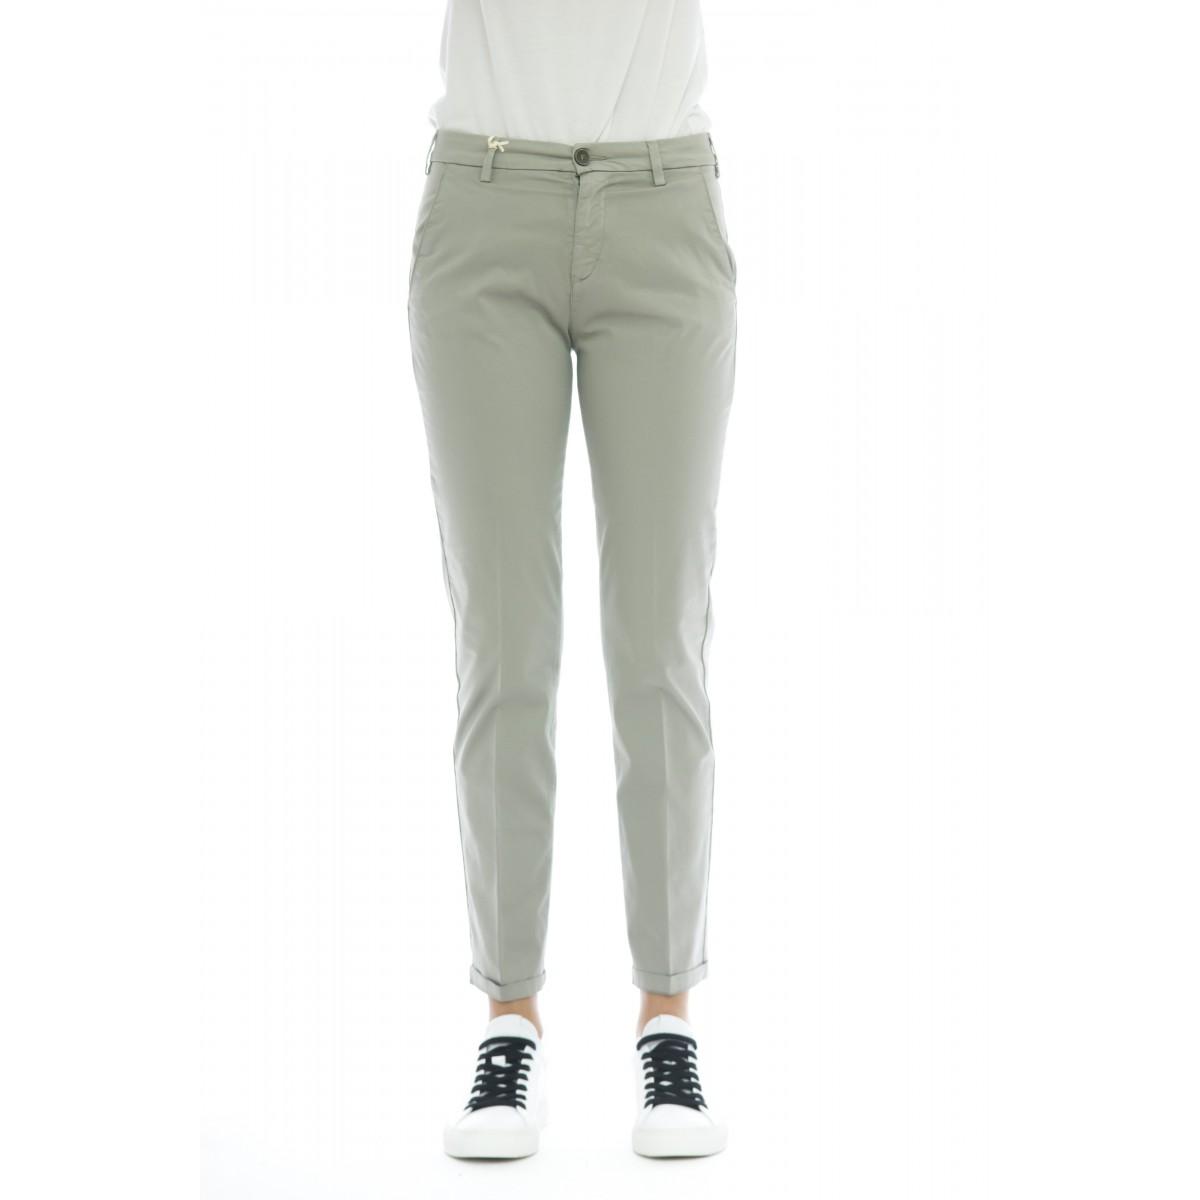 Pantalone donna - Briana 5443 tinta unita